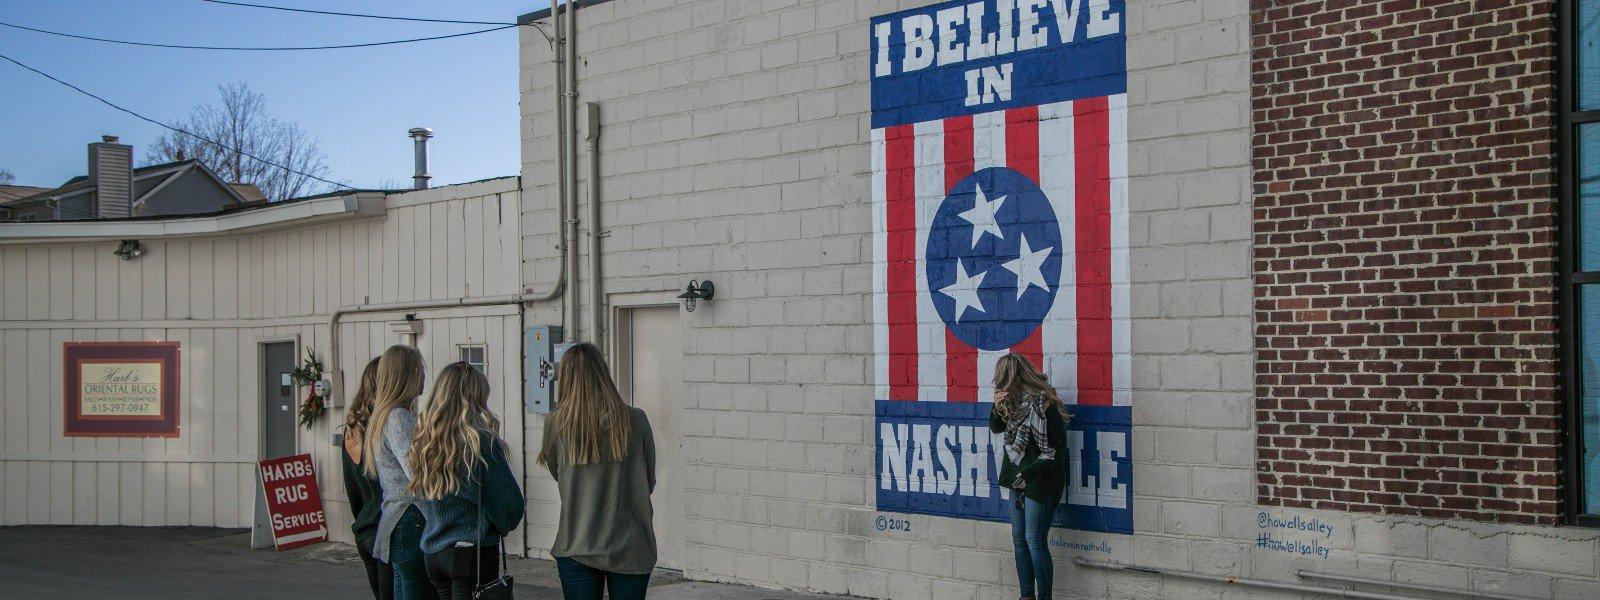 I believe in Nashville